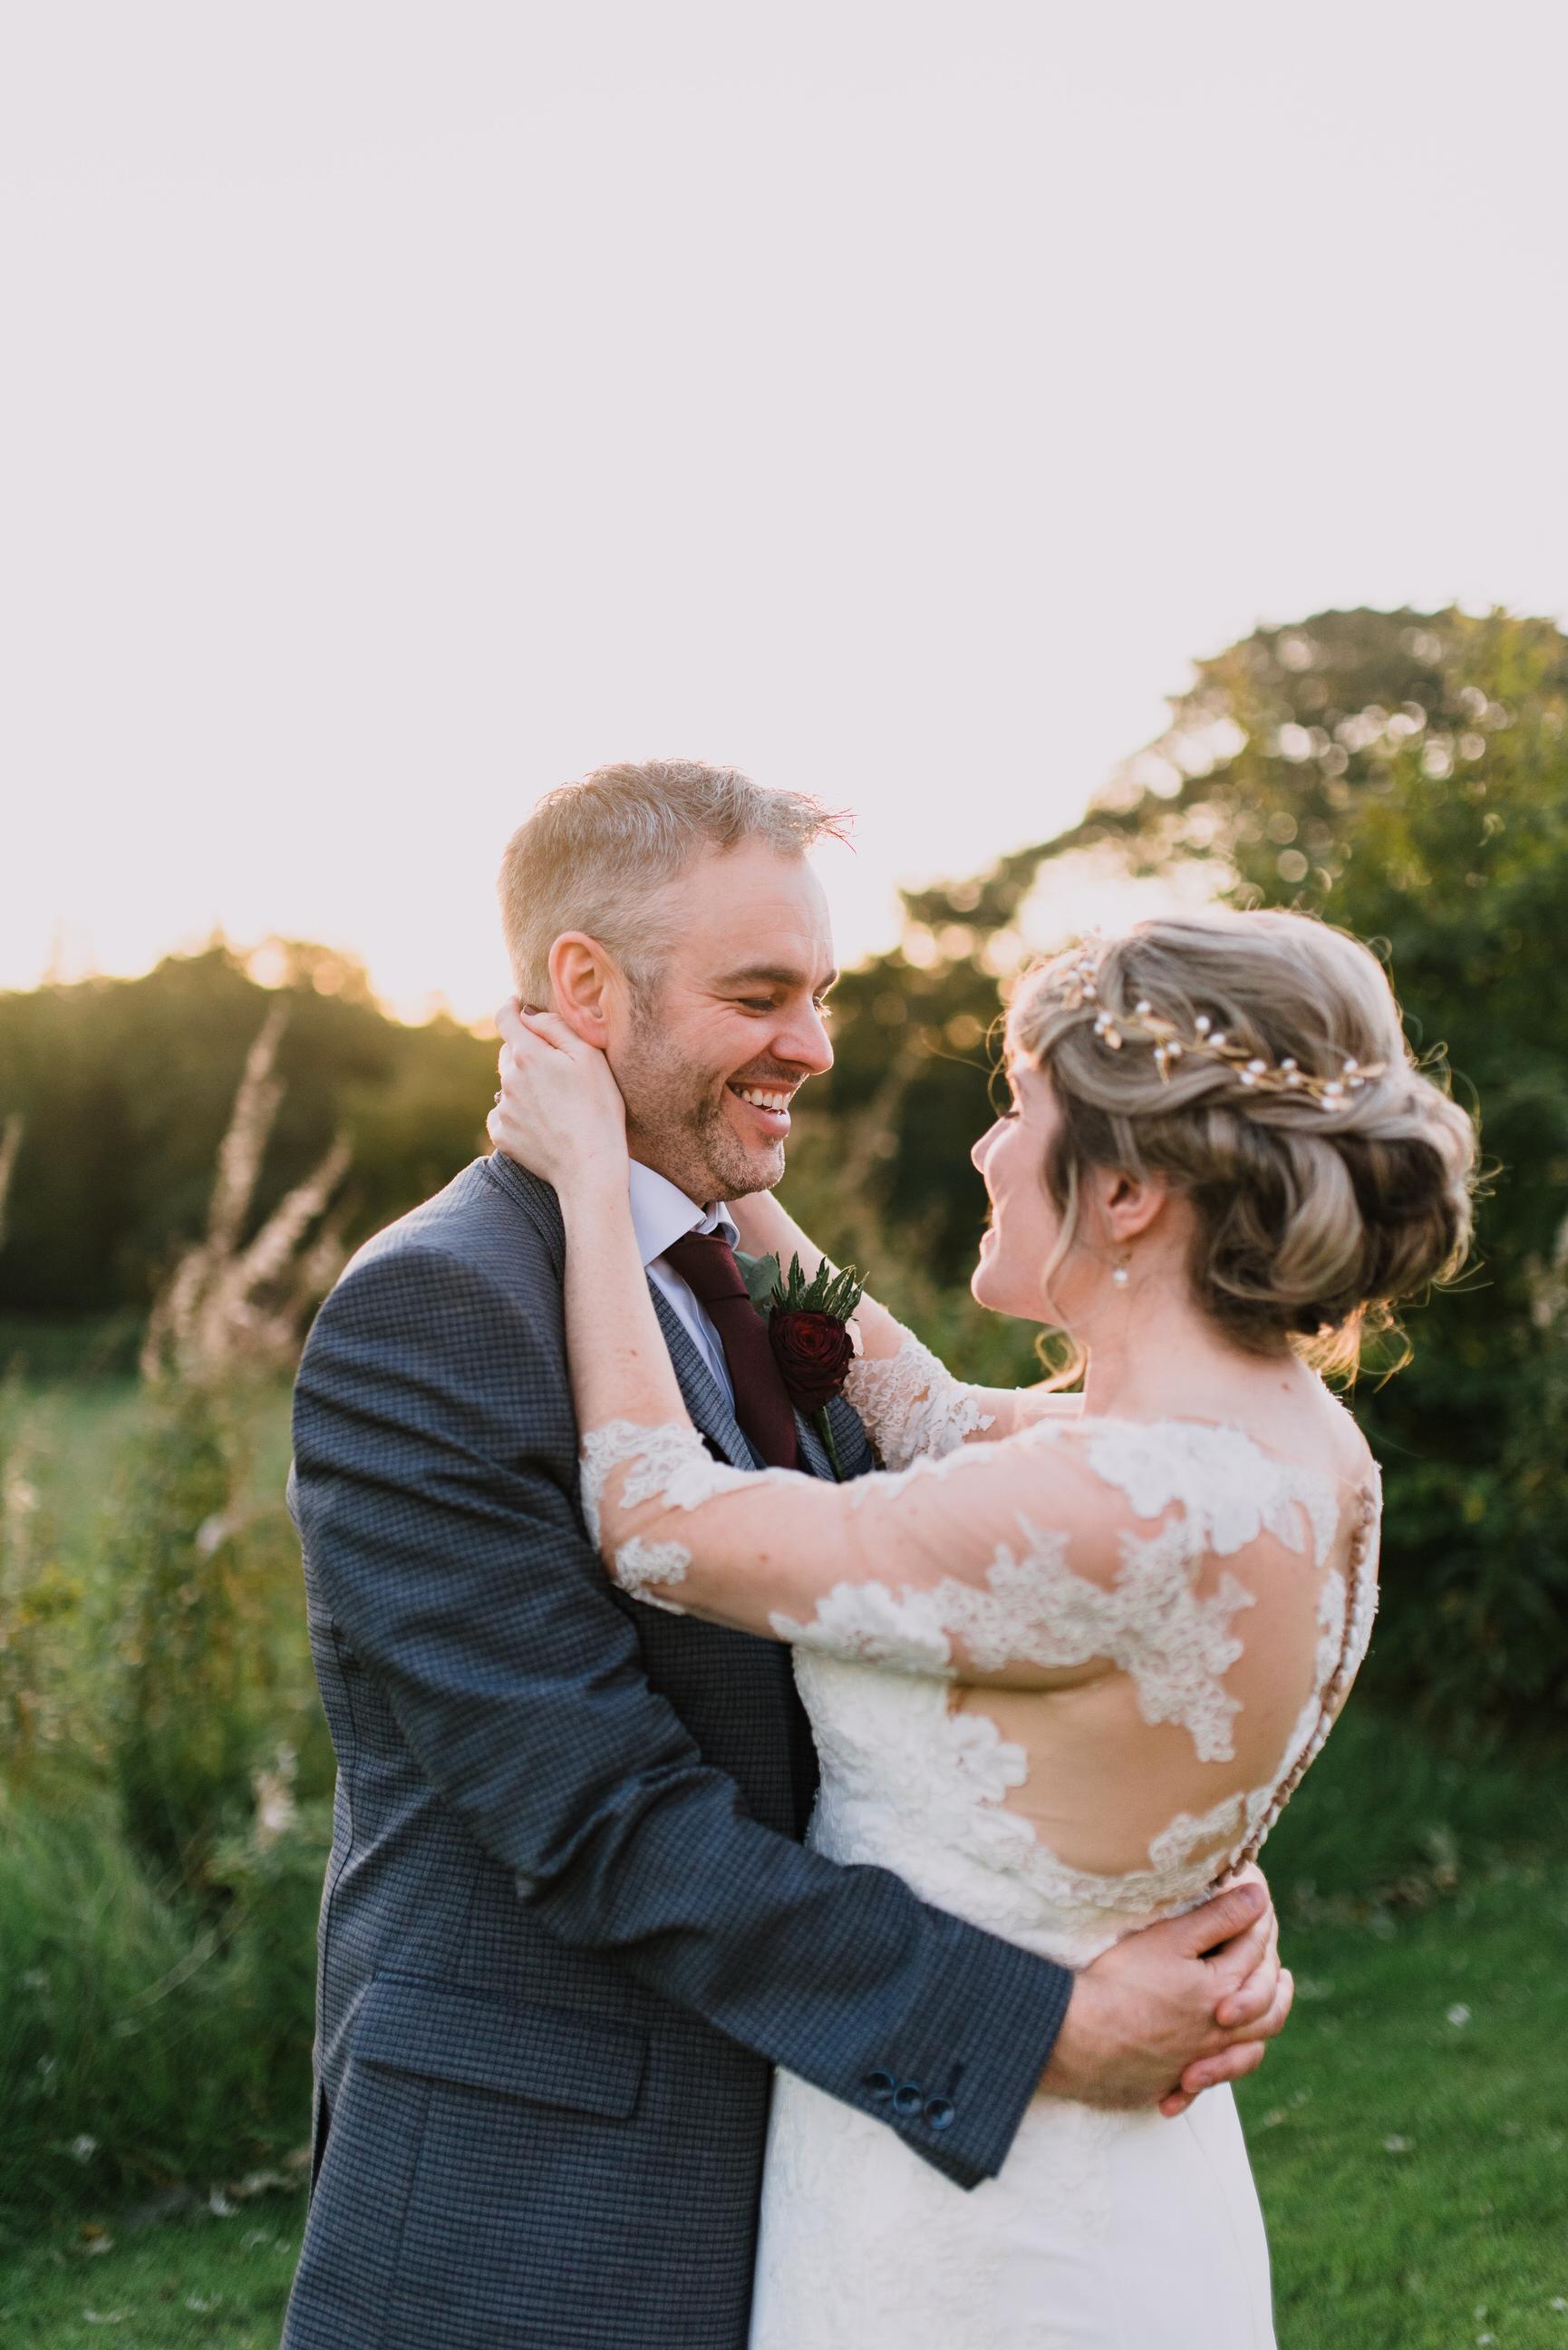 lissanoure castle wedding, northern ireland wedding photographer, romantic northern irish wedding venue, castle wedding ireland, natural wedding photography ni (121).jpg